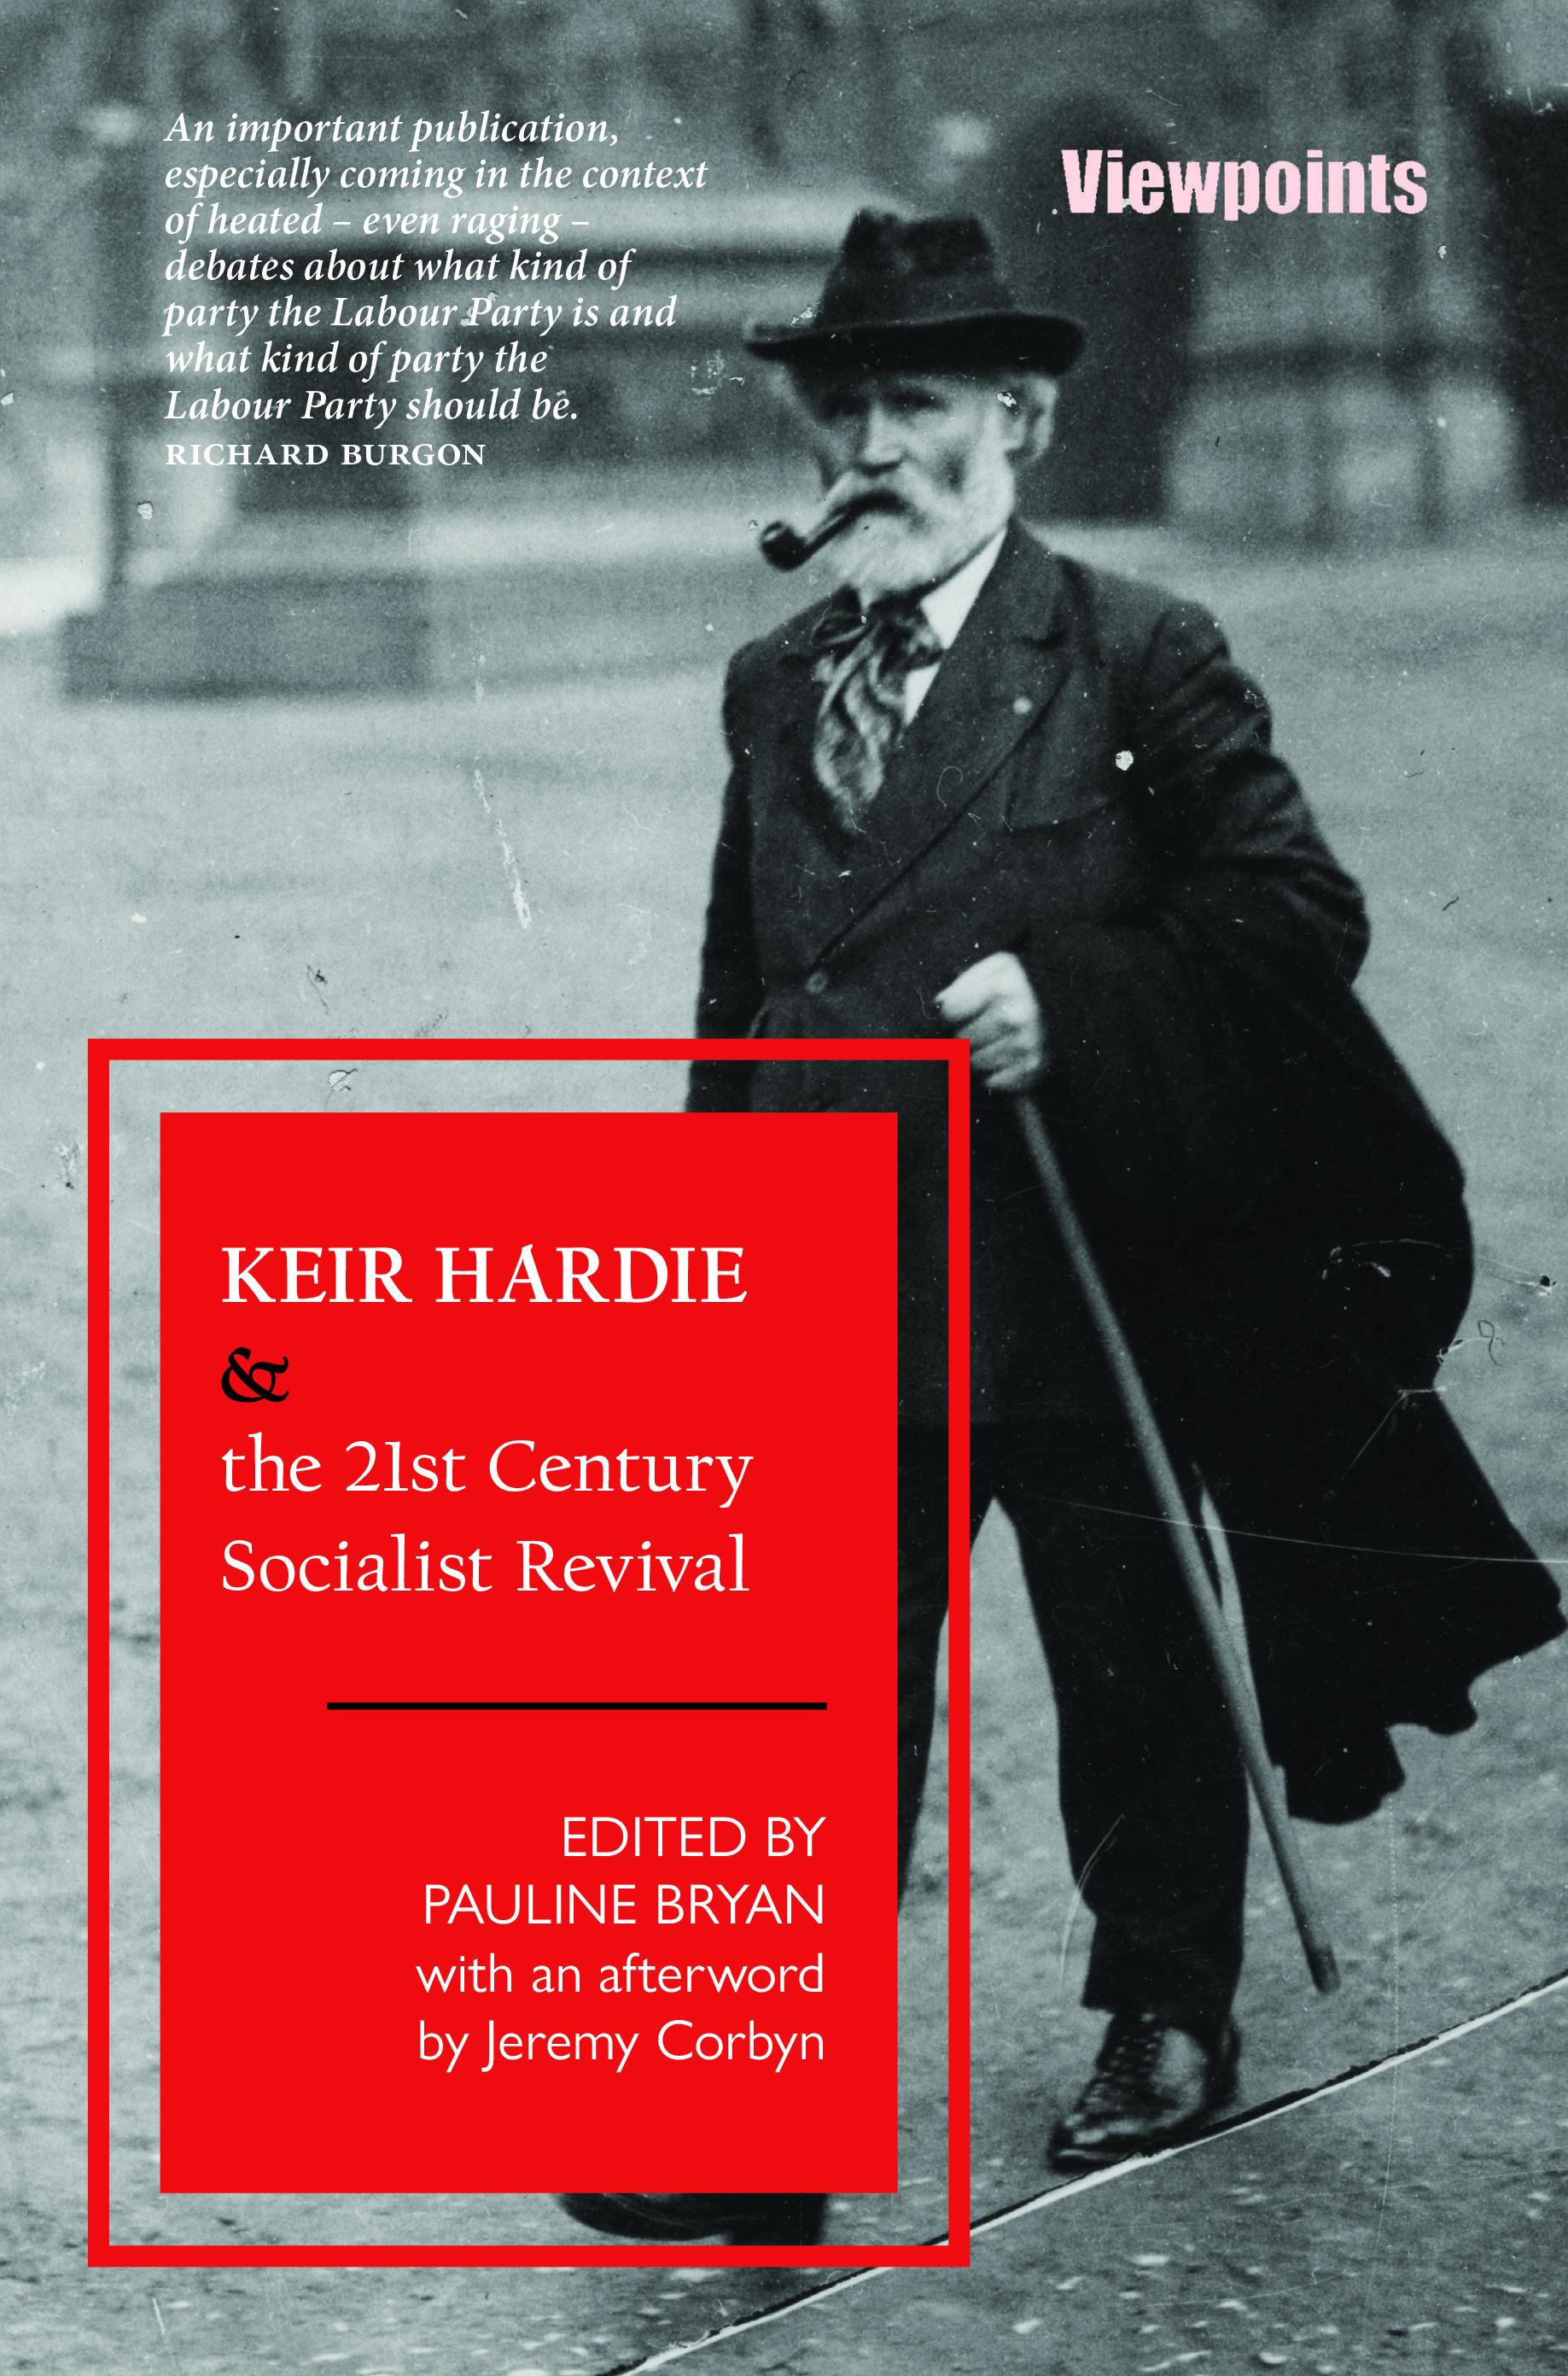 Keir Hardie and the 21st Century Socialist Revival 9781913025038 Luath Press.jpg